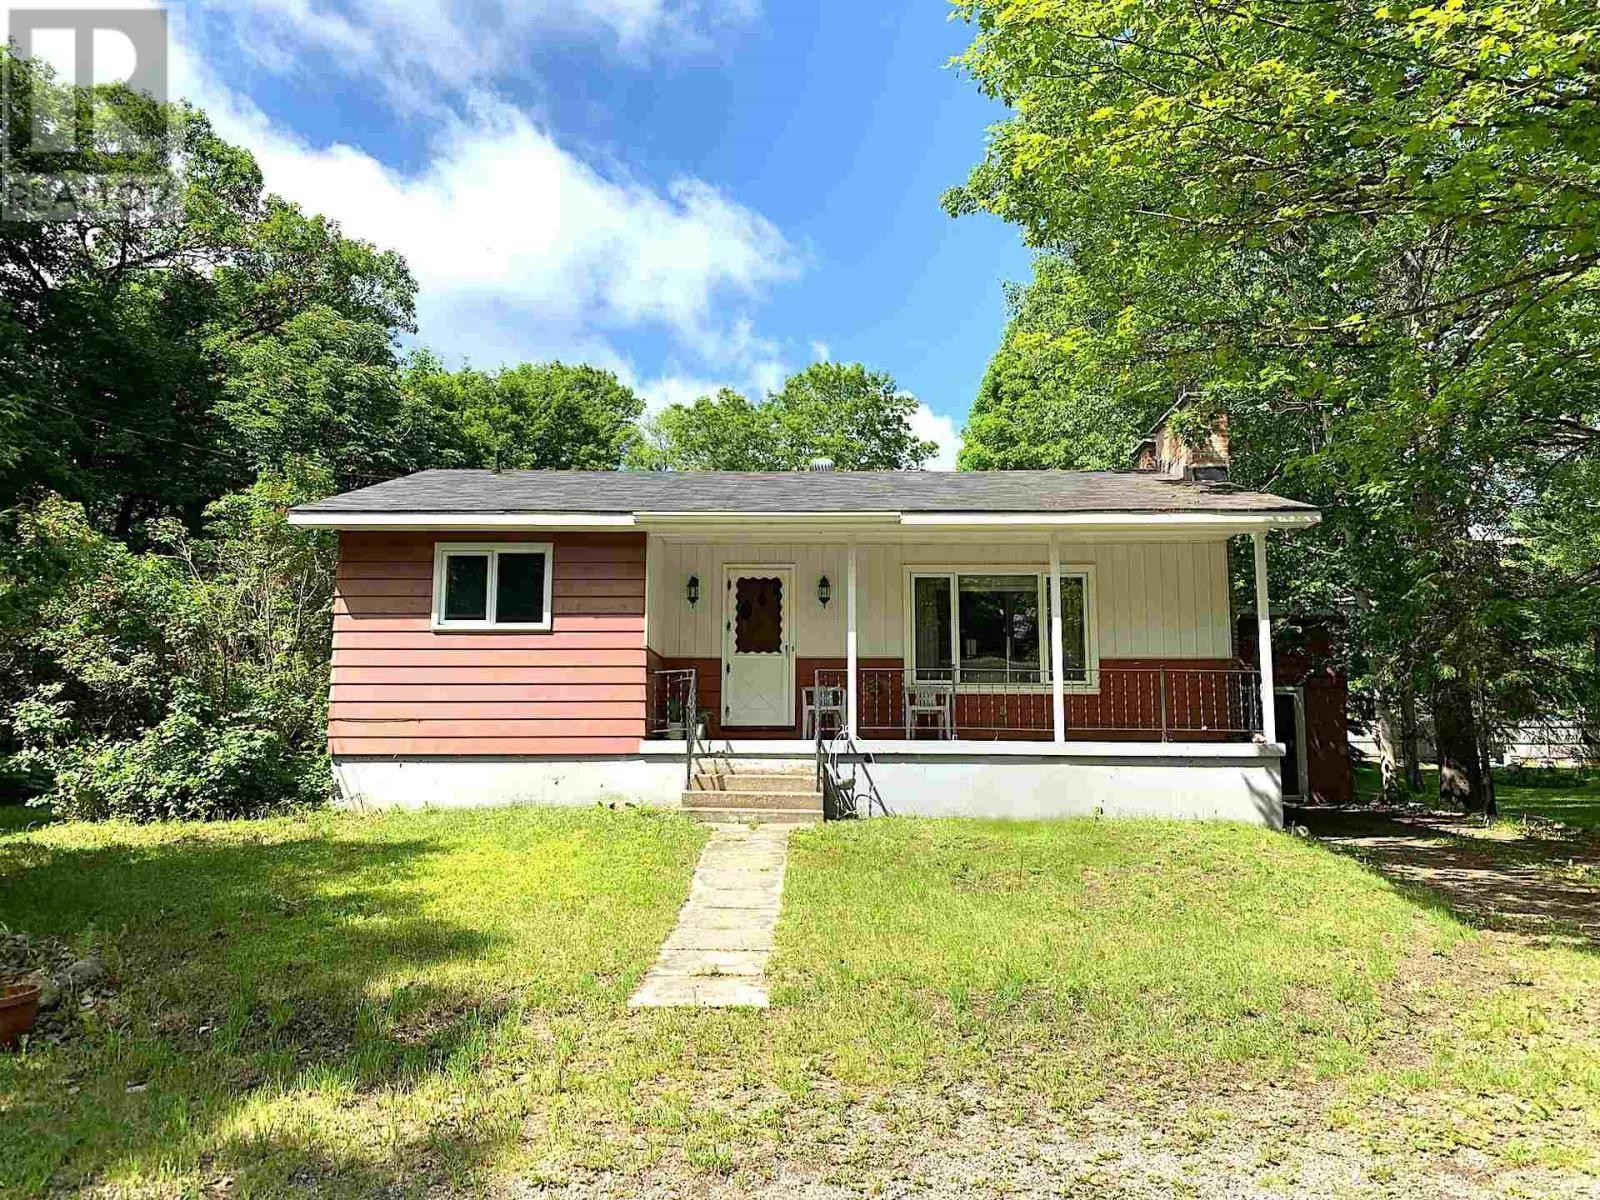 House for sale at 3045 Canoe Point Rd Hilton Beach Ontario - MLS: SM126095